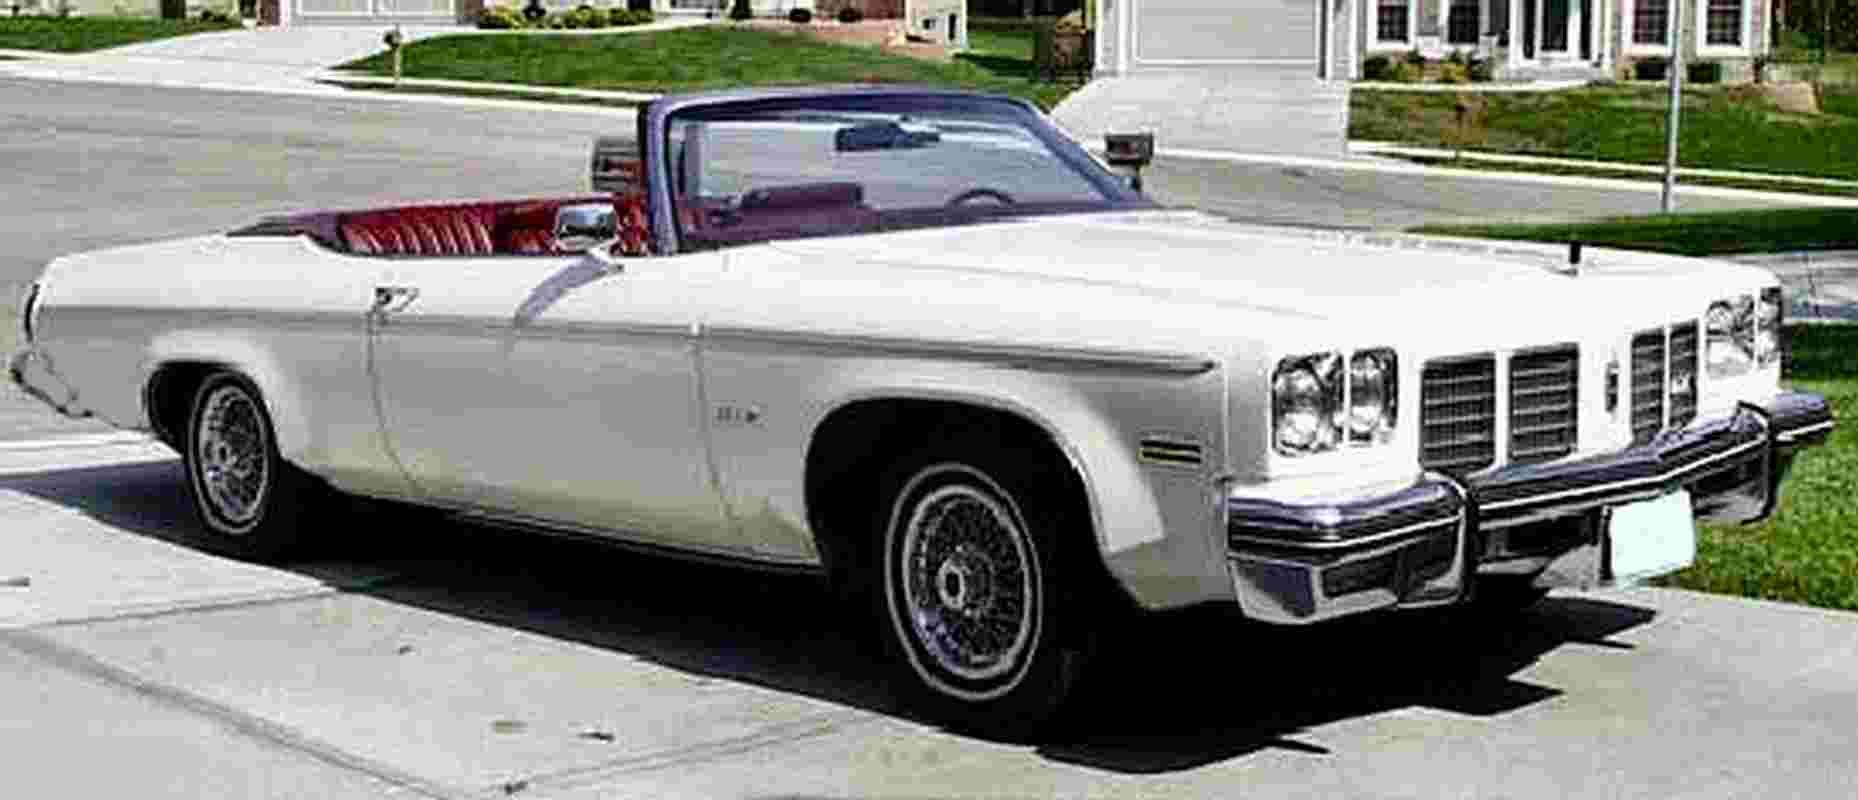 1975 Oldsmobile Delta 88 Royale Convertible